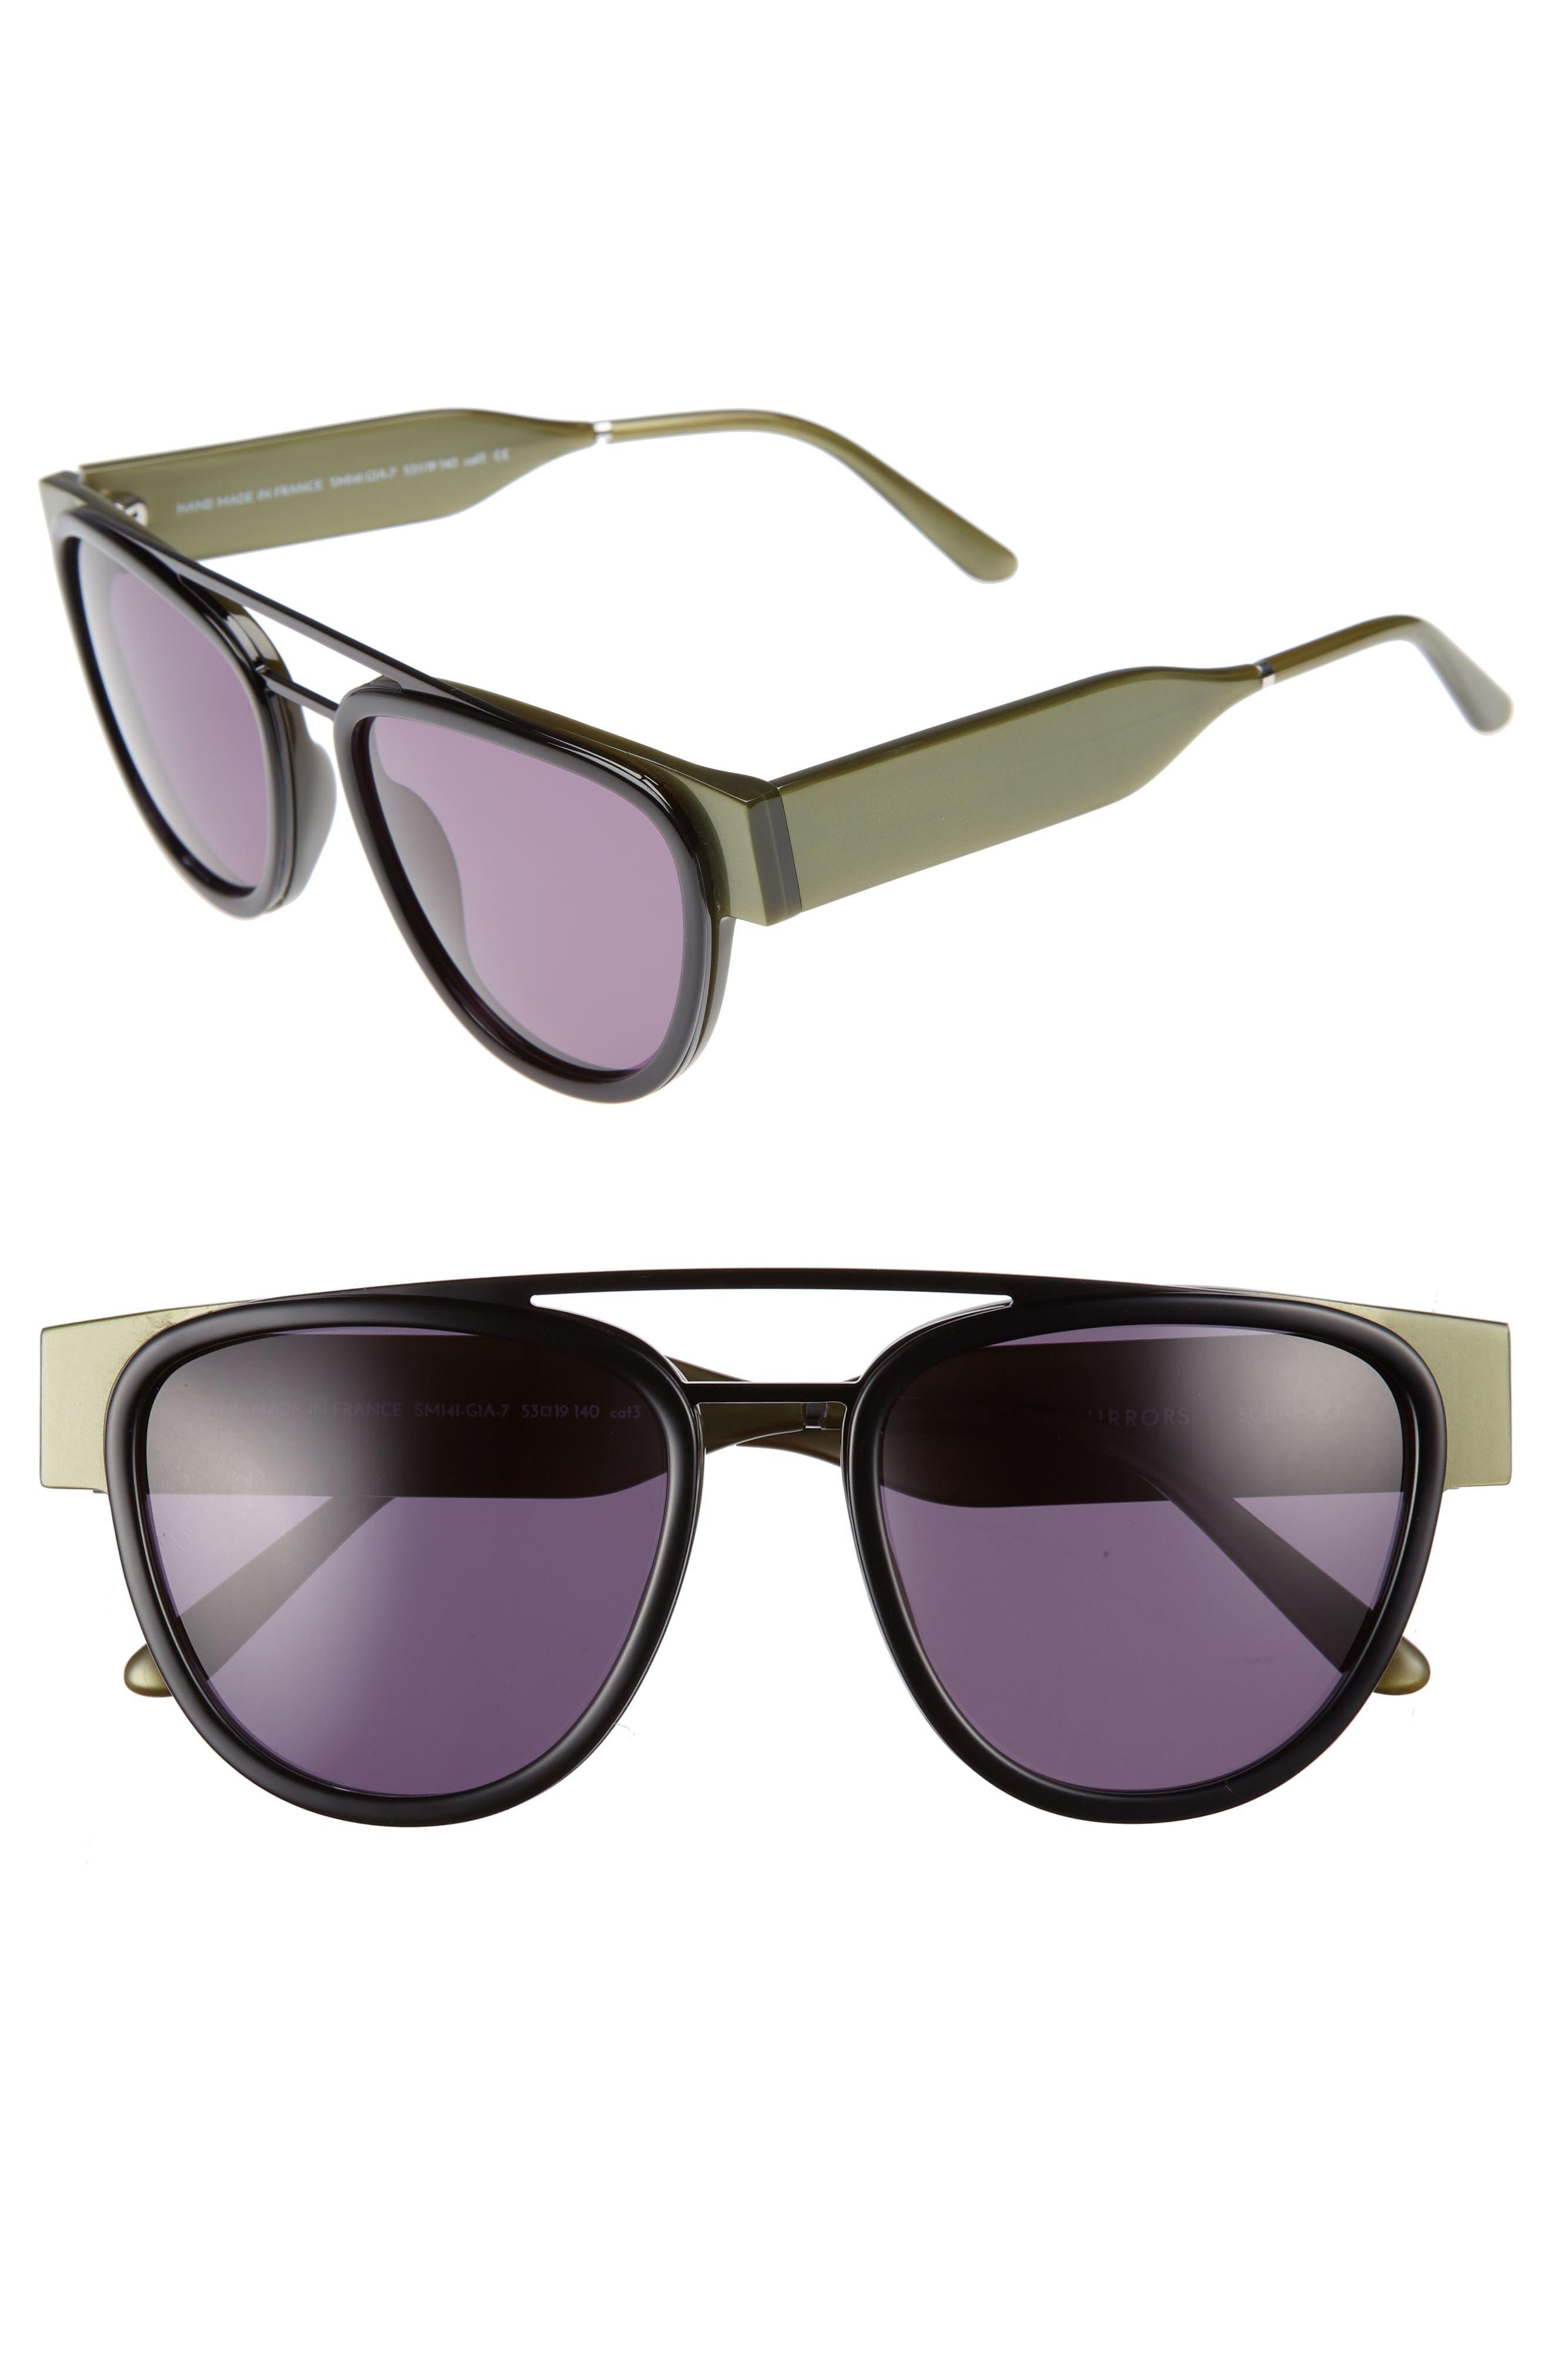 SMOKE X MIRRORS Soda Pop 2 52mm Round Sunglasses